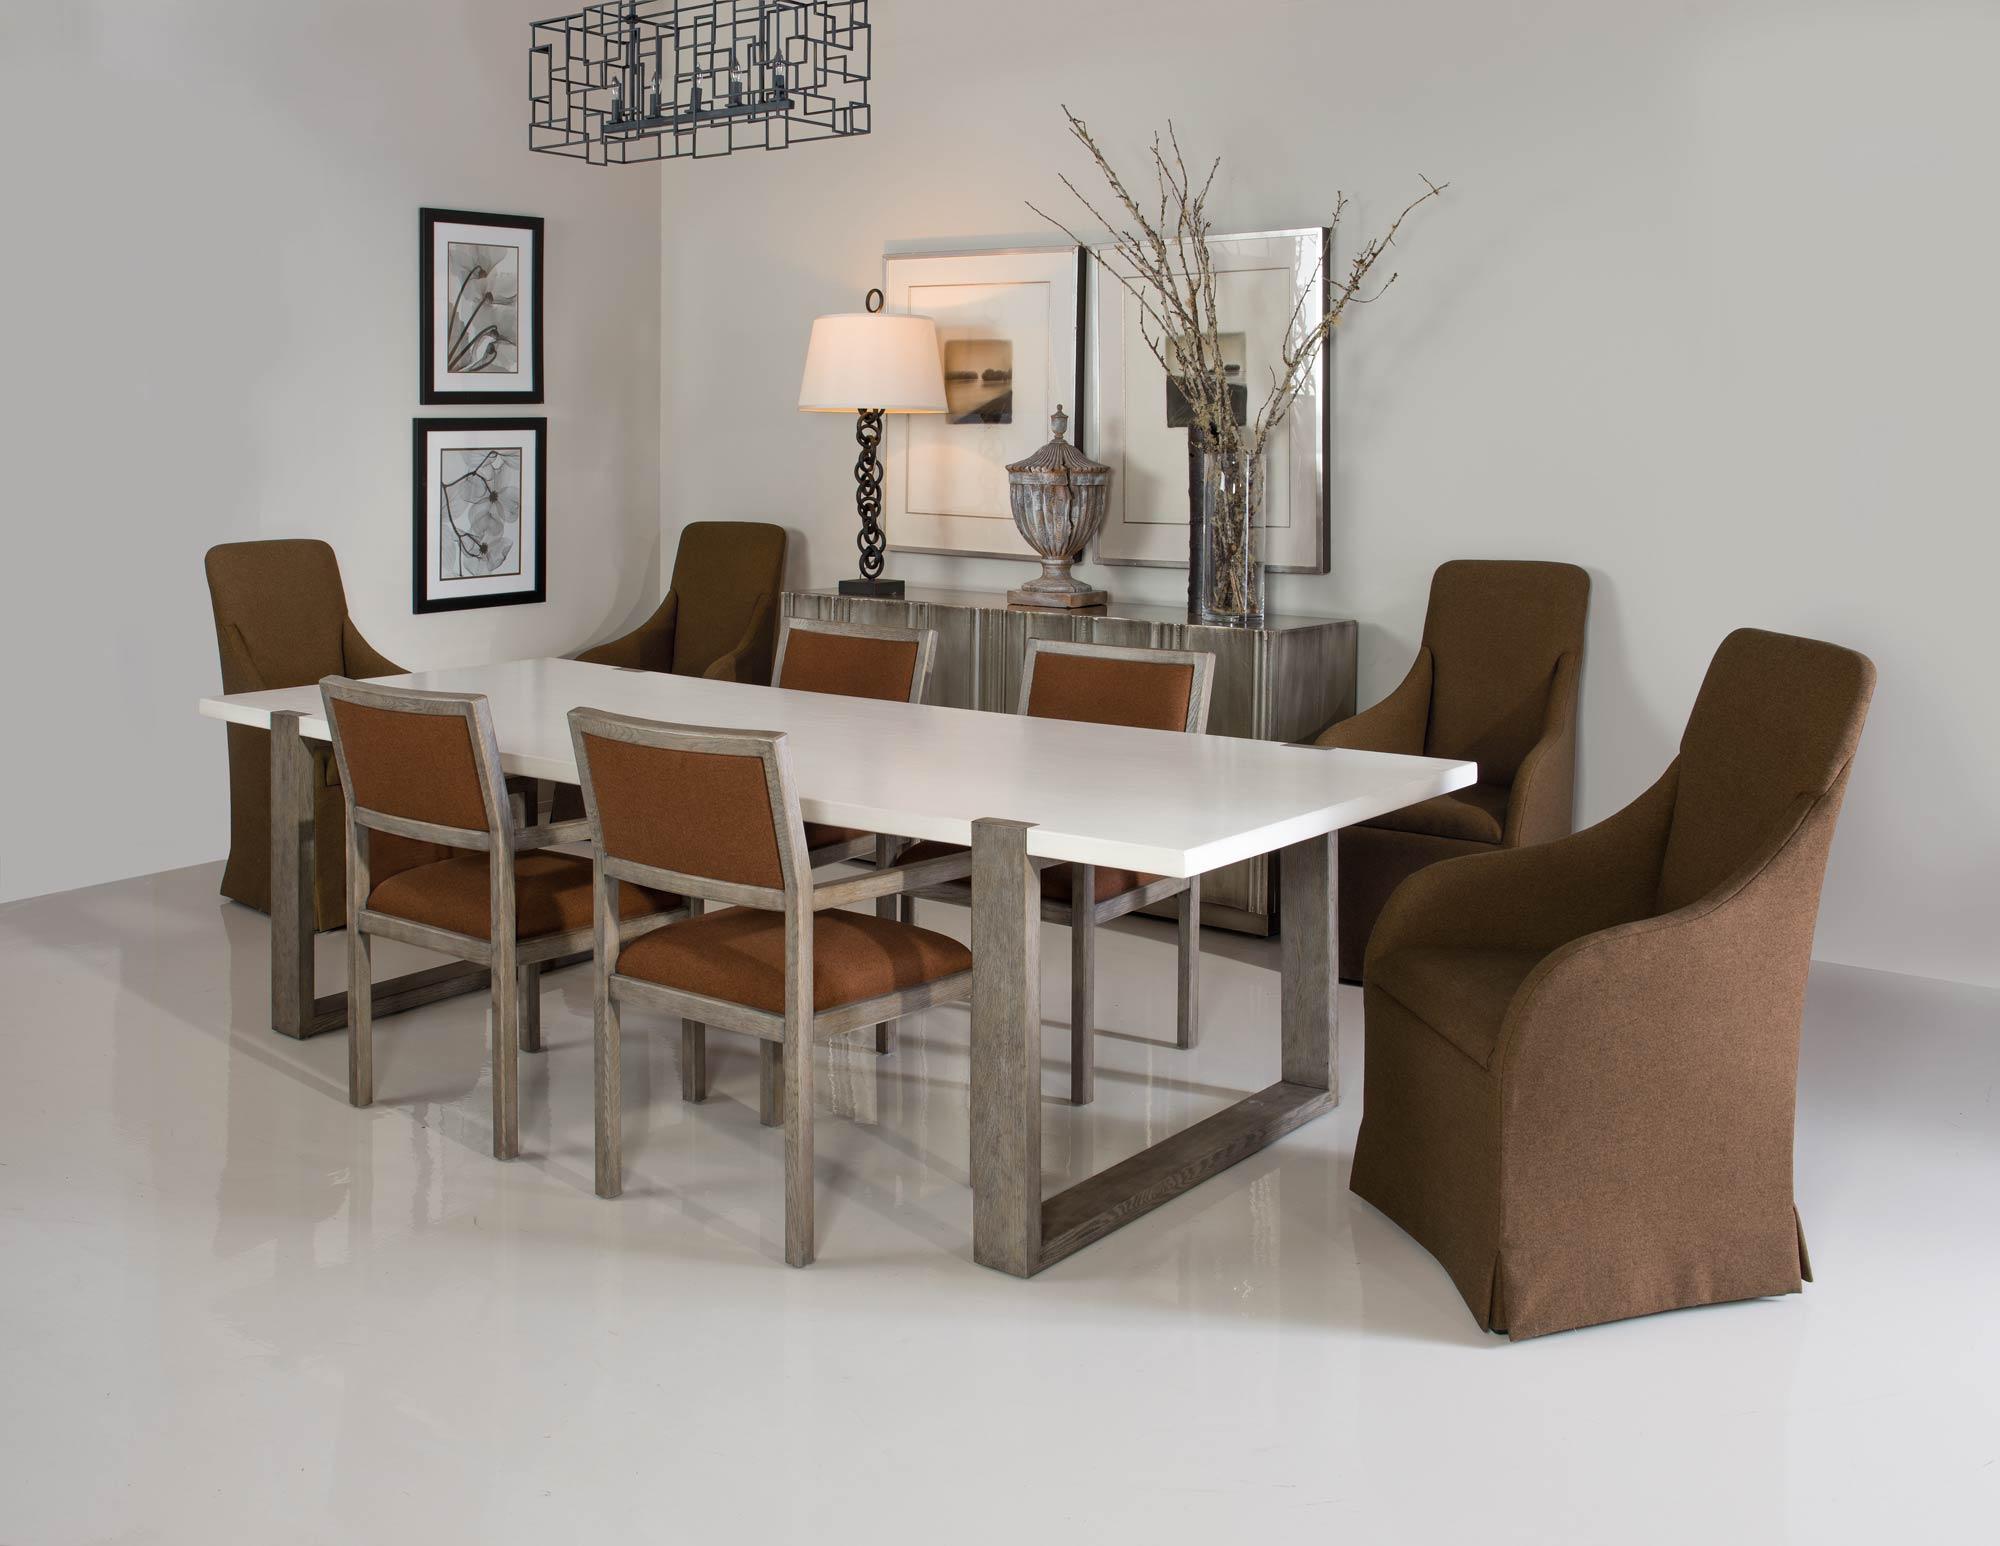 Hadleigh_Dining_Table_Setting_Bernhardt.jpg